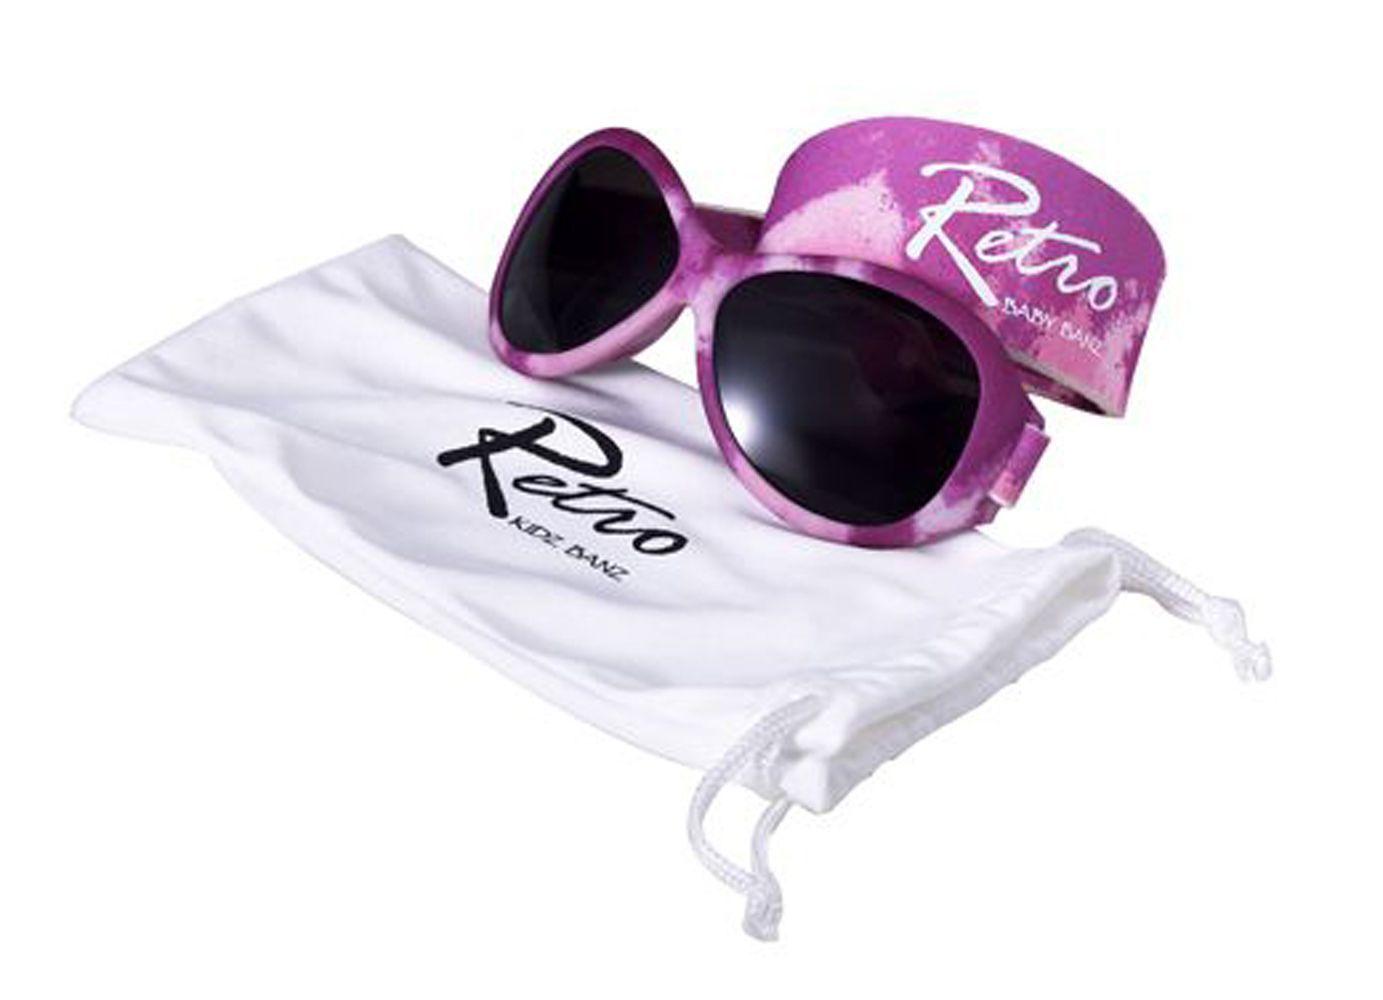 Kidz Banz Retro - Pink Camo - Oculos Escuros Protecao UV